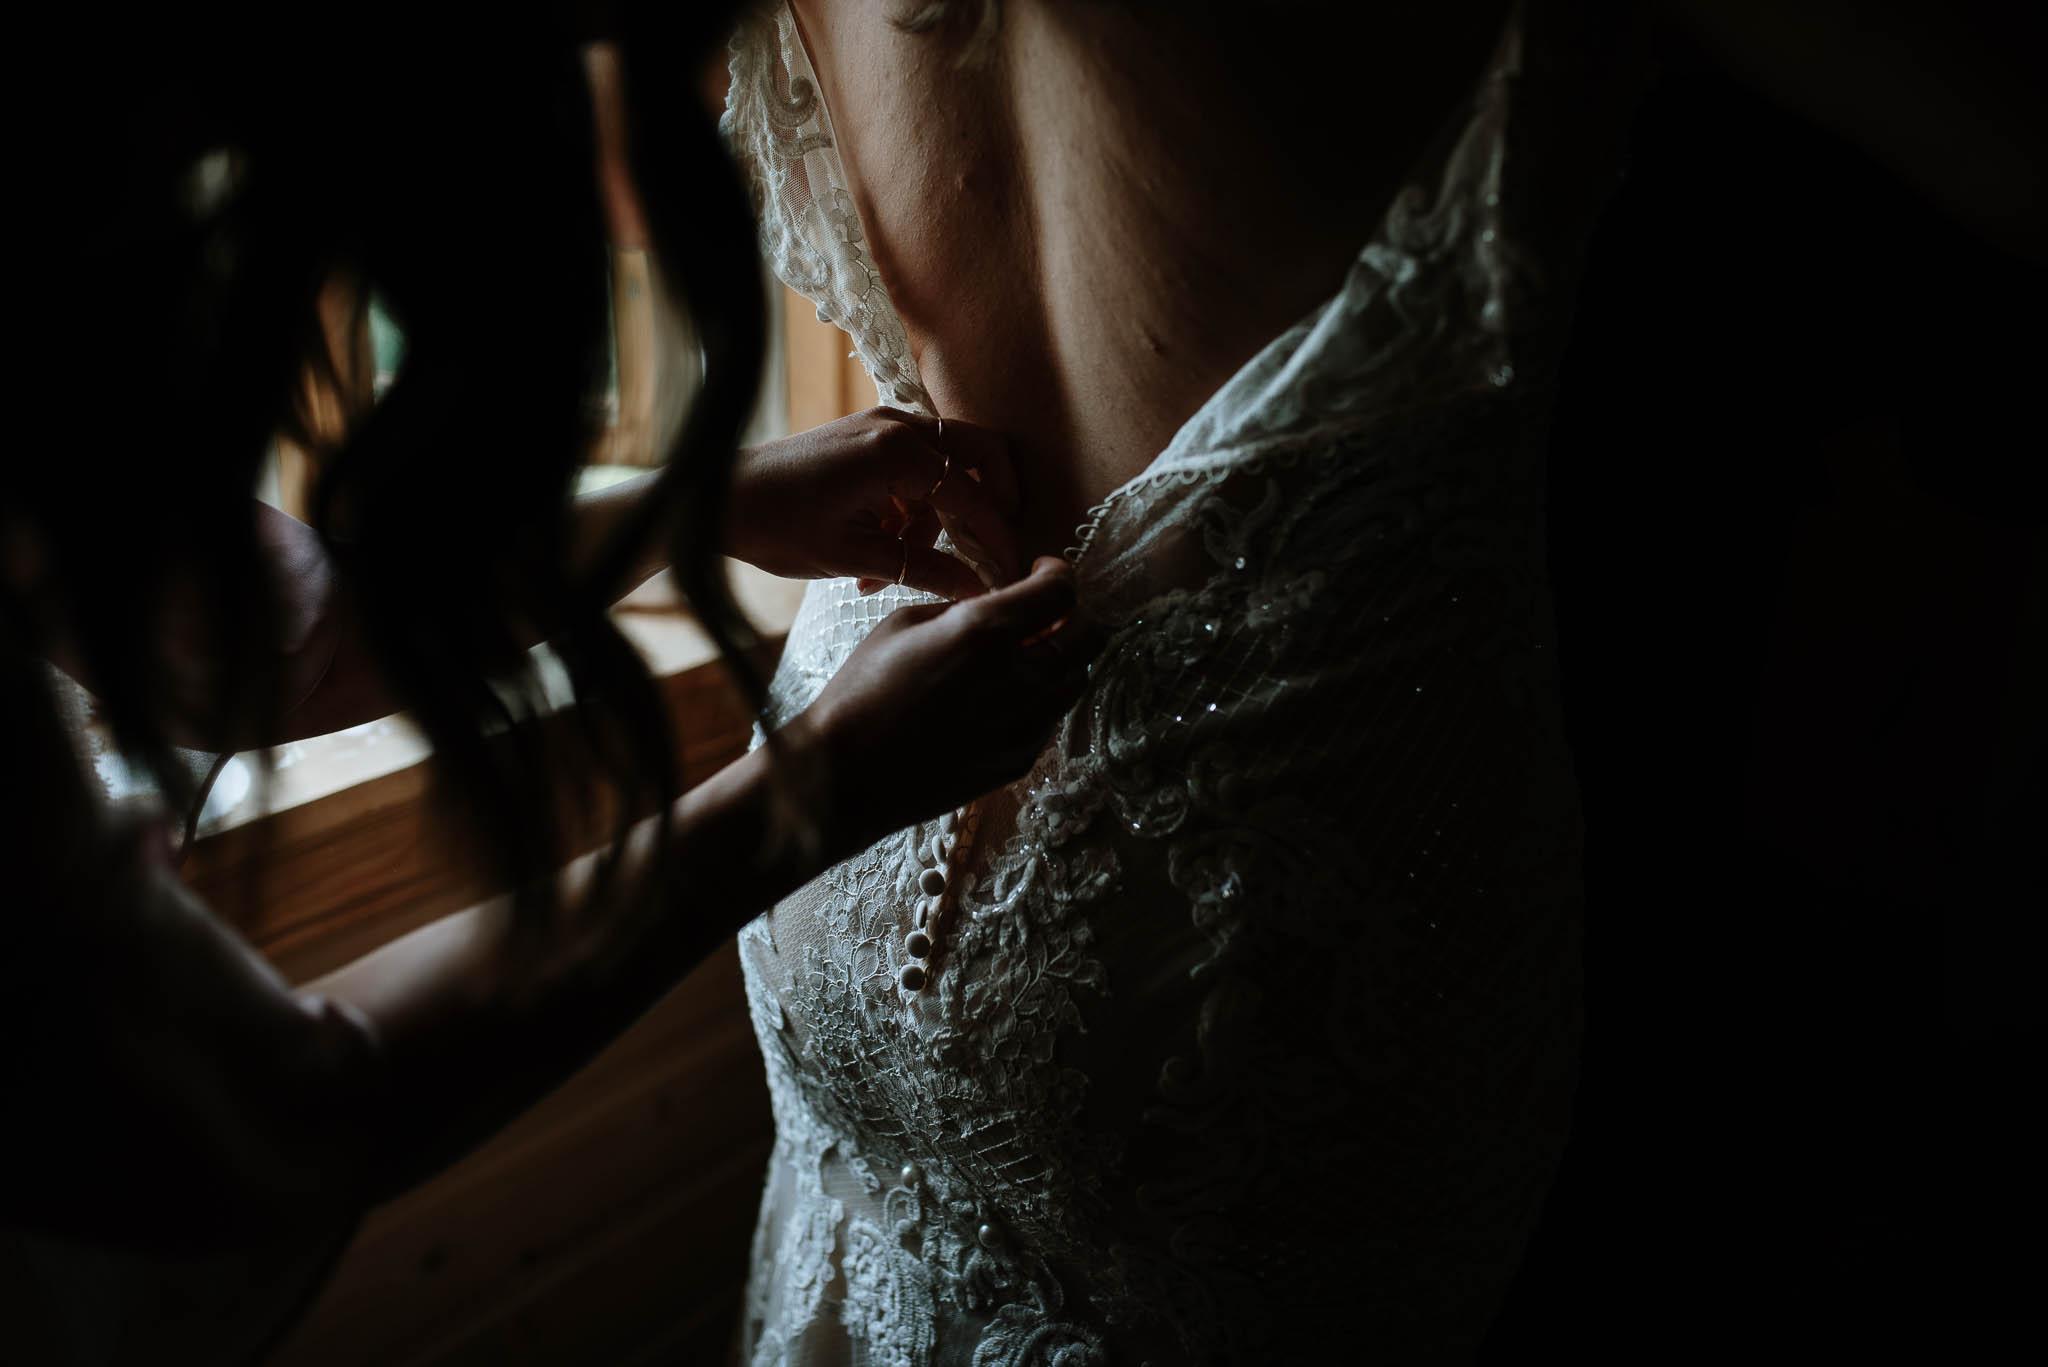 Bryllupsfotograf i Lofoten - wedding photographer Lofoten - bryllup harstad-15.jpg